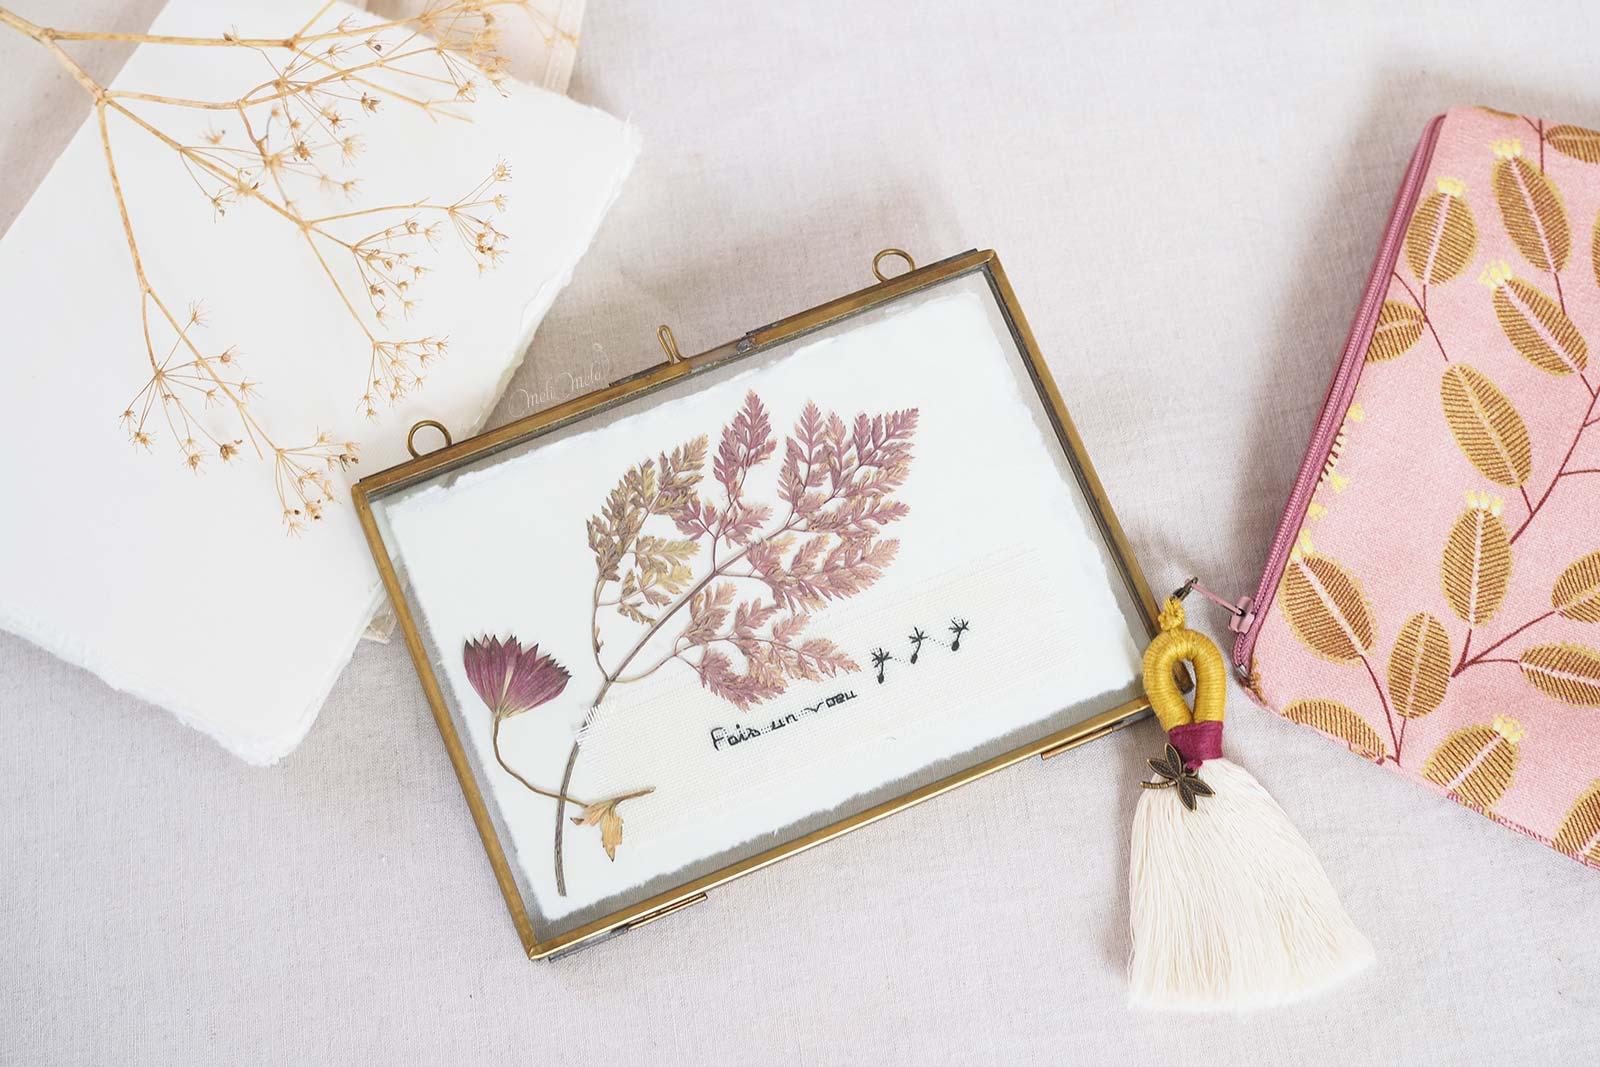 cadre-herbier-fleur-astrance-rose-pourpre-laboutiquedemelimelo